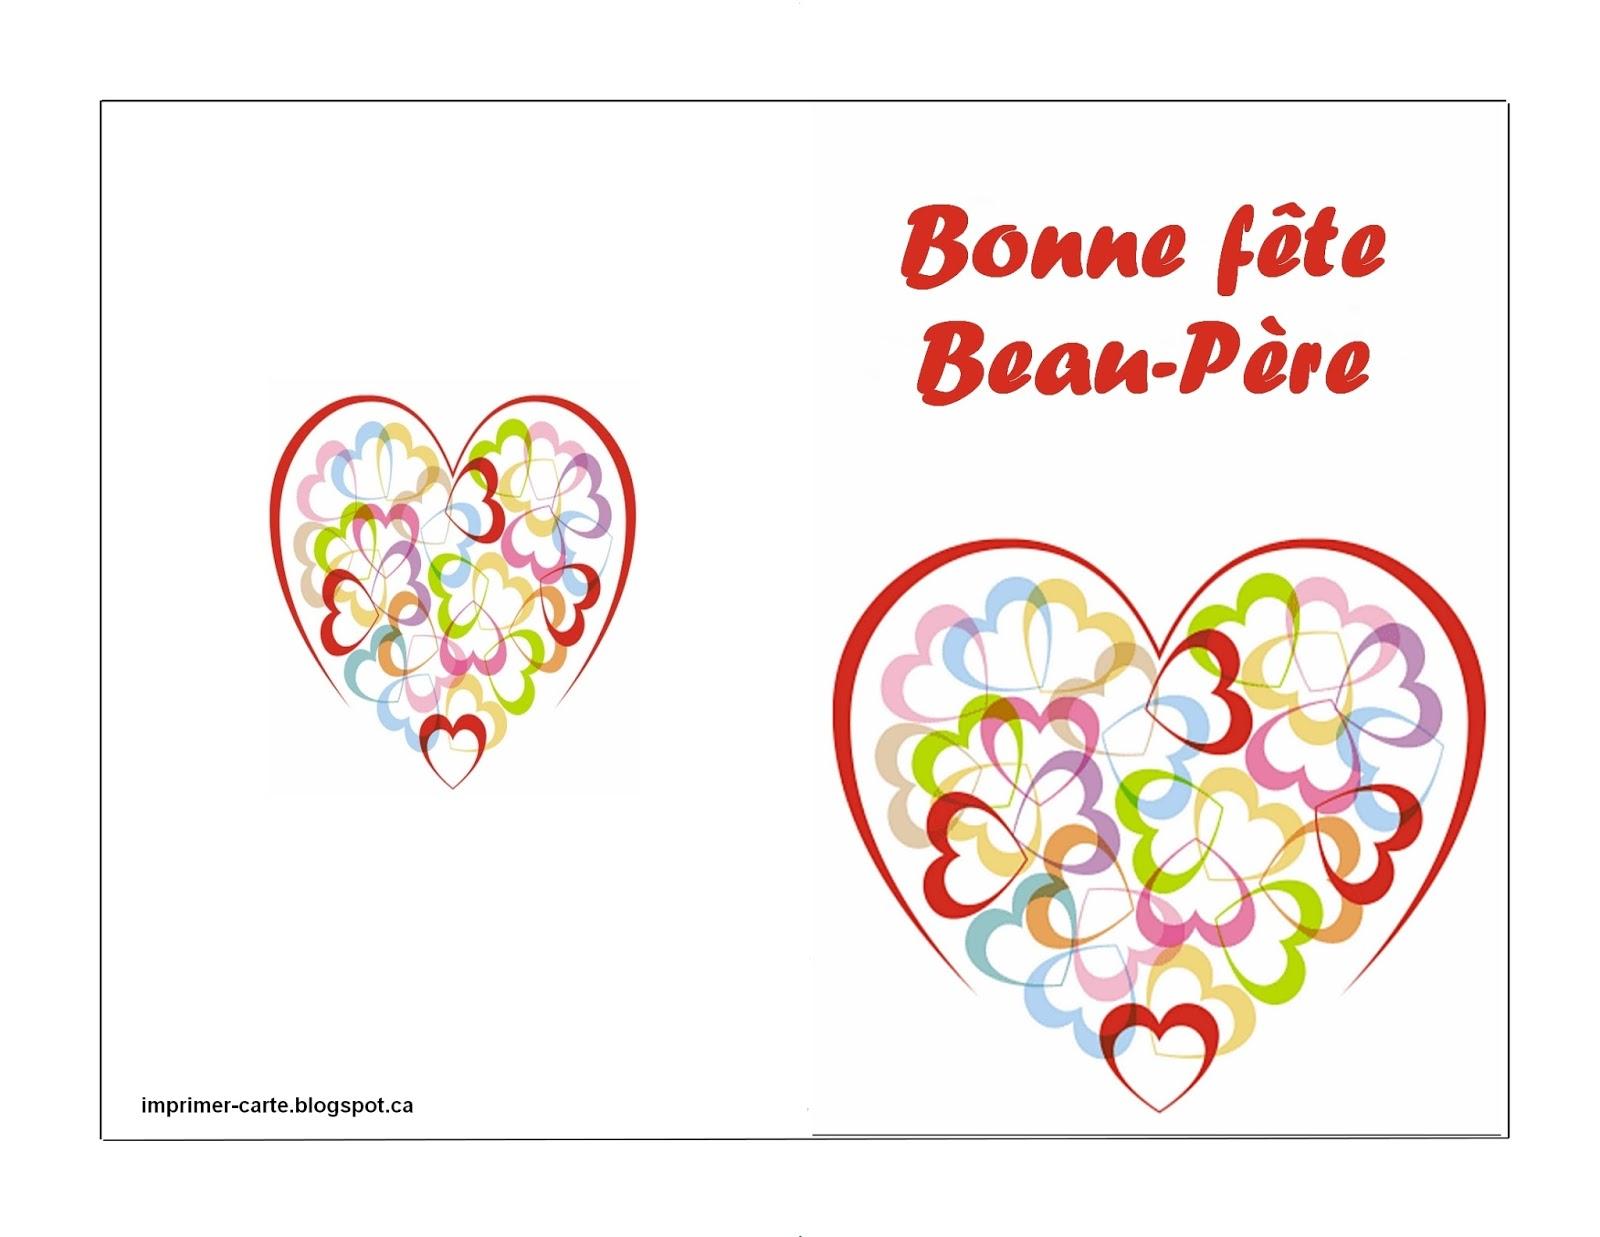 Modele Texte Anniversaire Beau Pere Wizzyloremaria Site